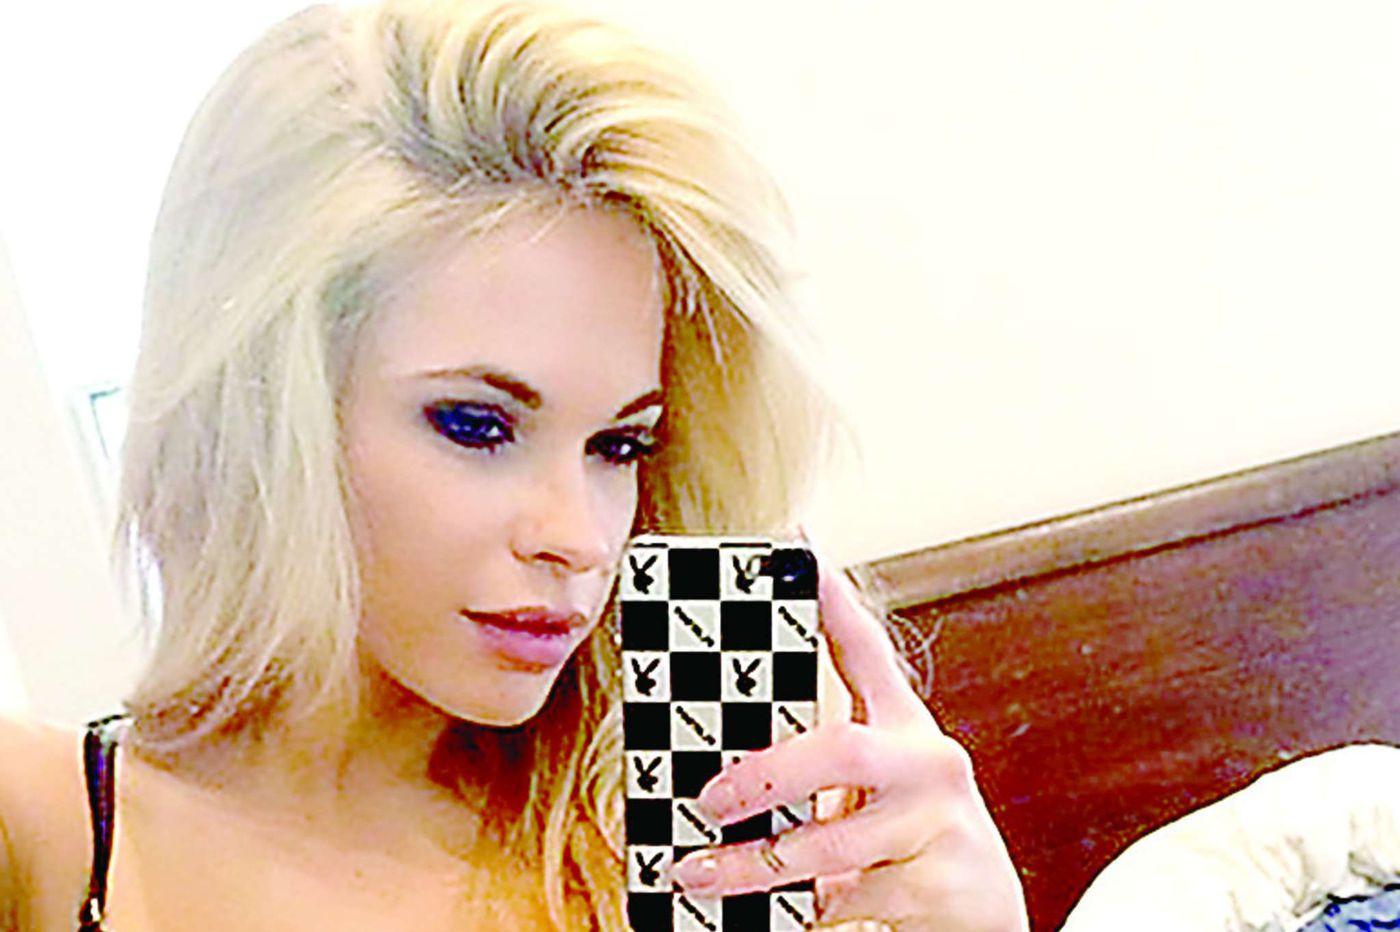 Playboy Playmate pleads not guilty in locker room body-shaming case